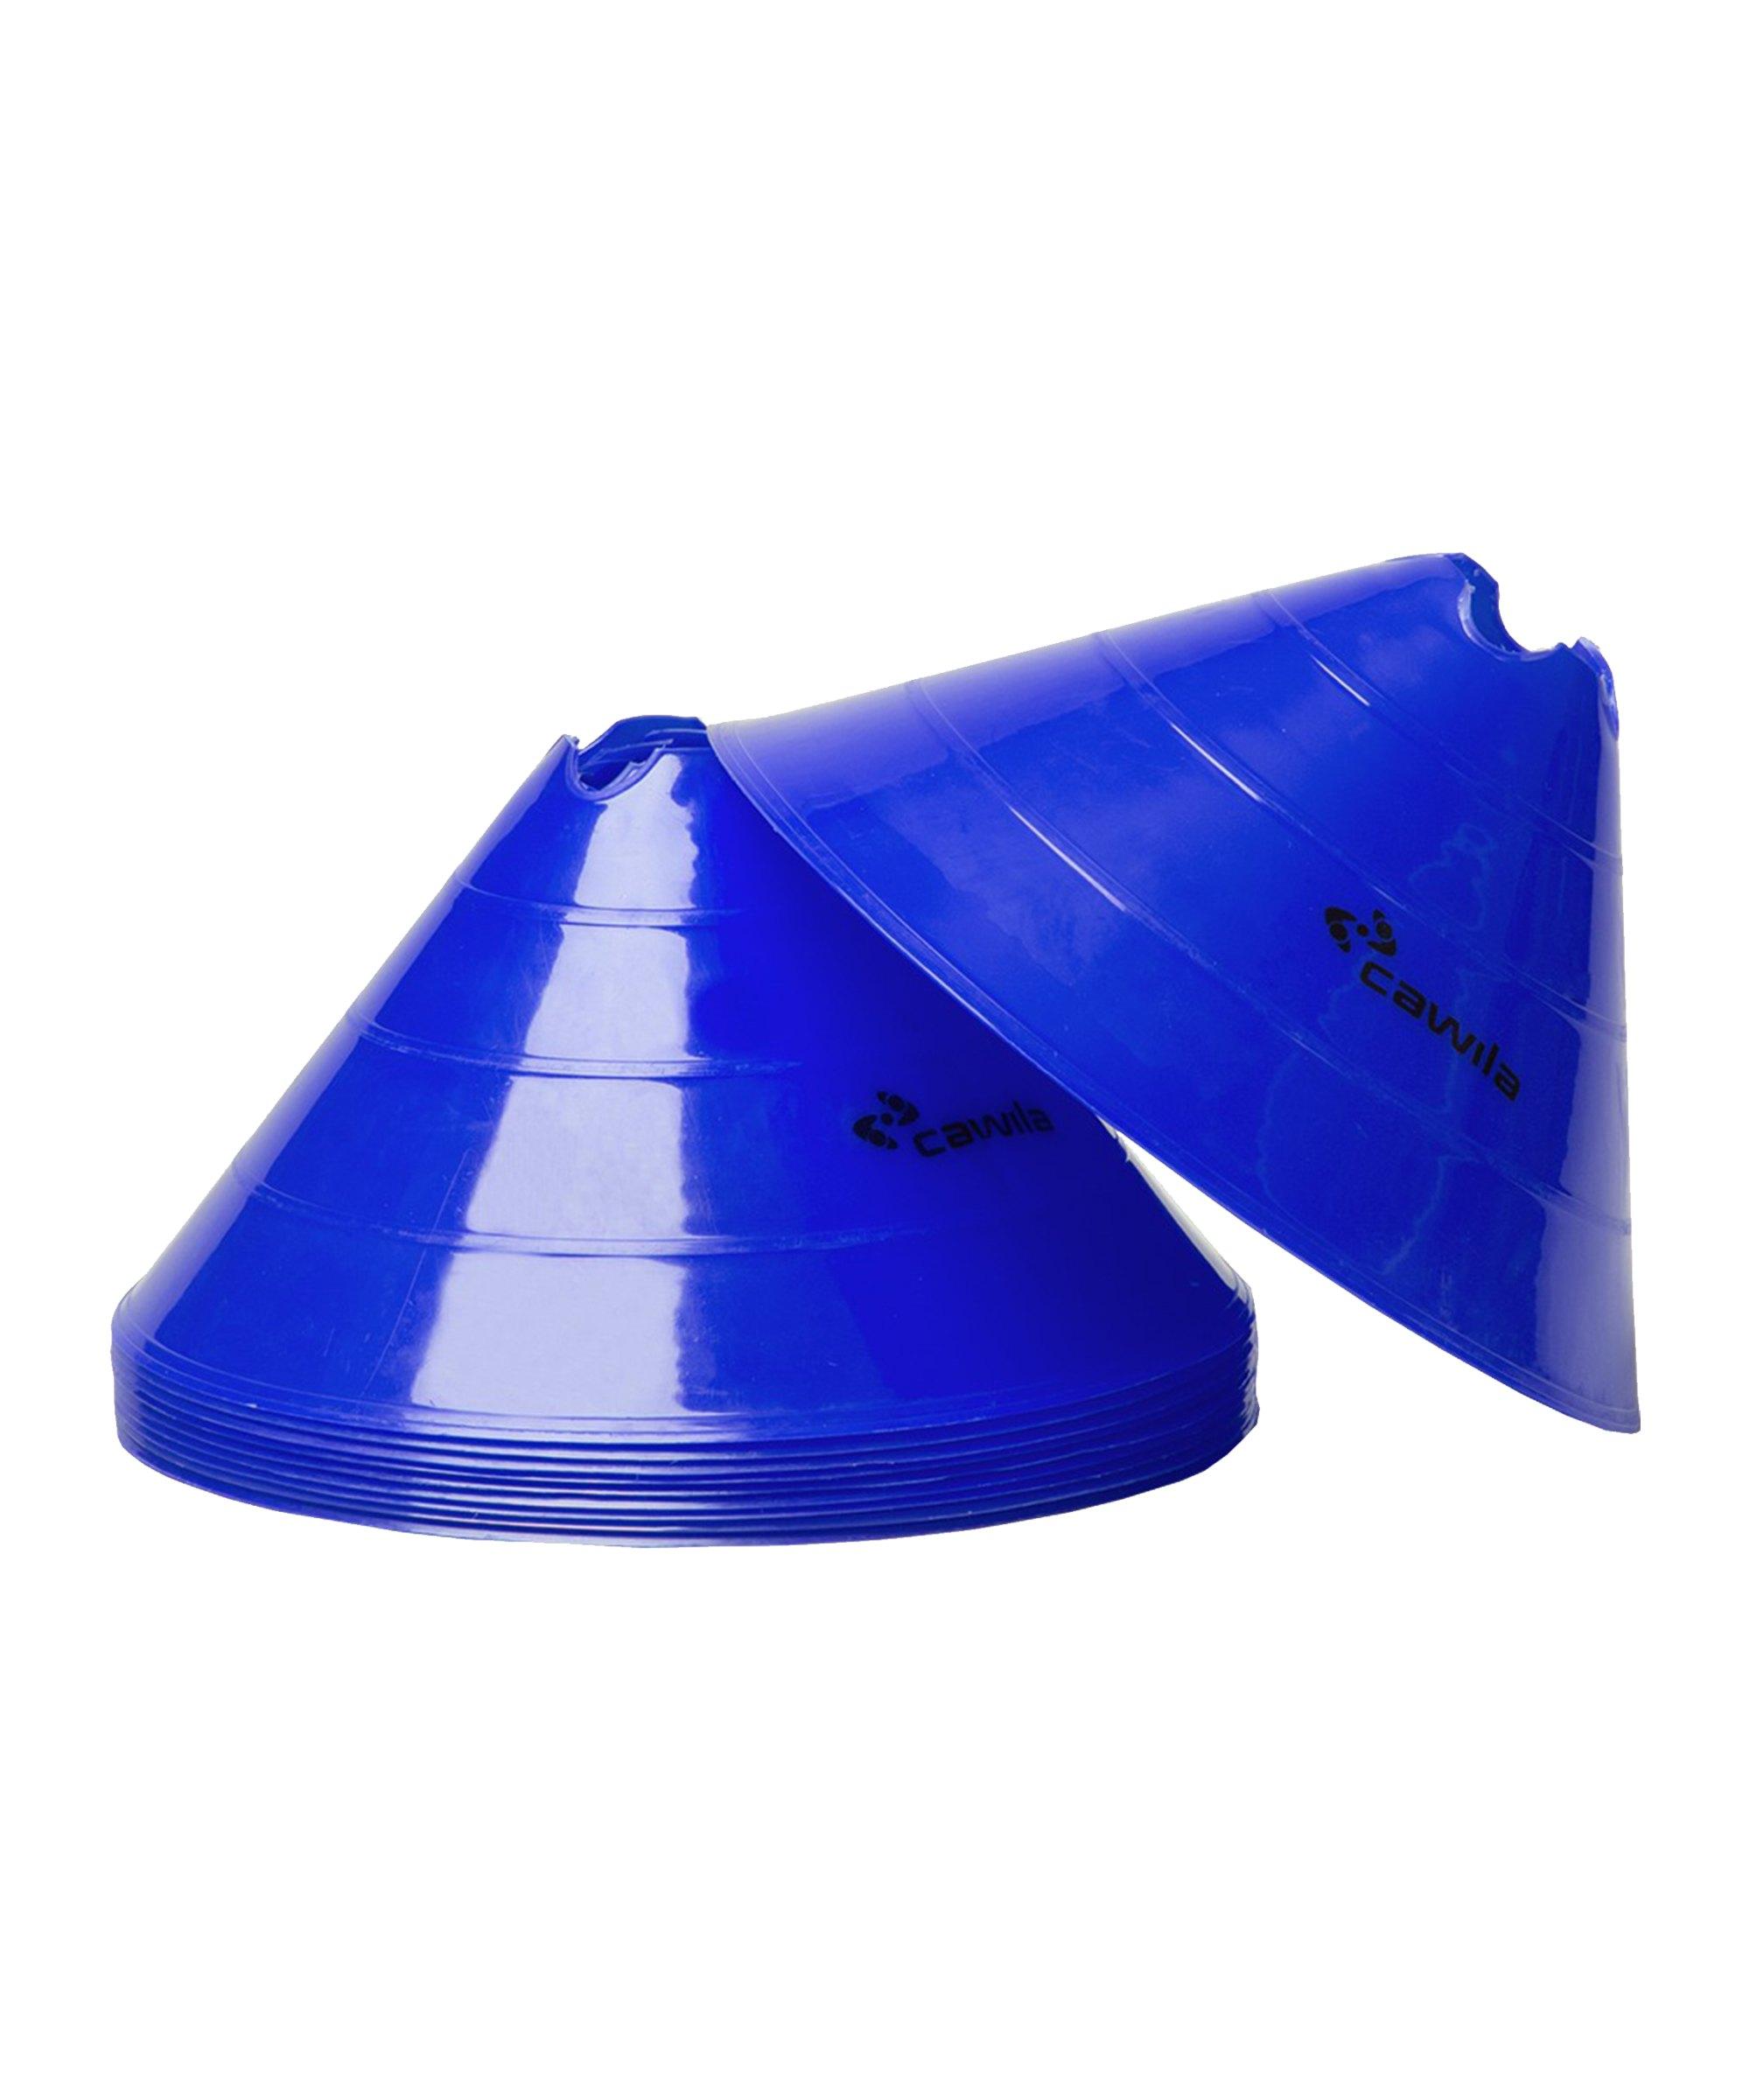 Cawila Markier.Scheiben L 10er d30cm 15cm Blau - blau